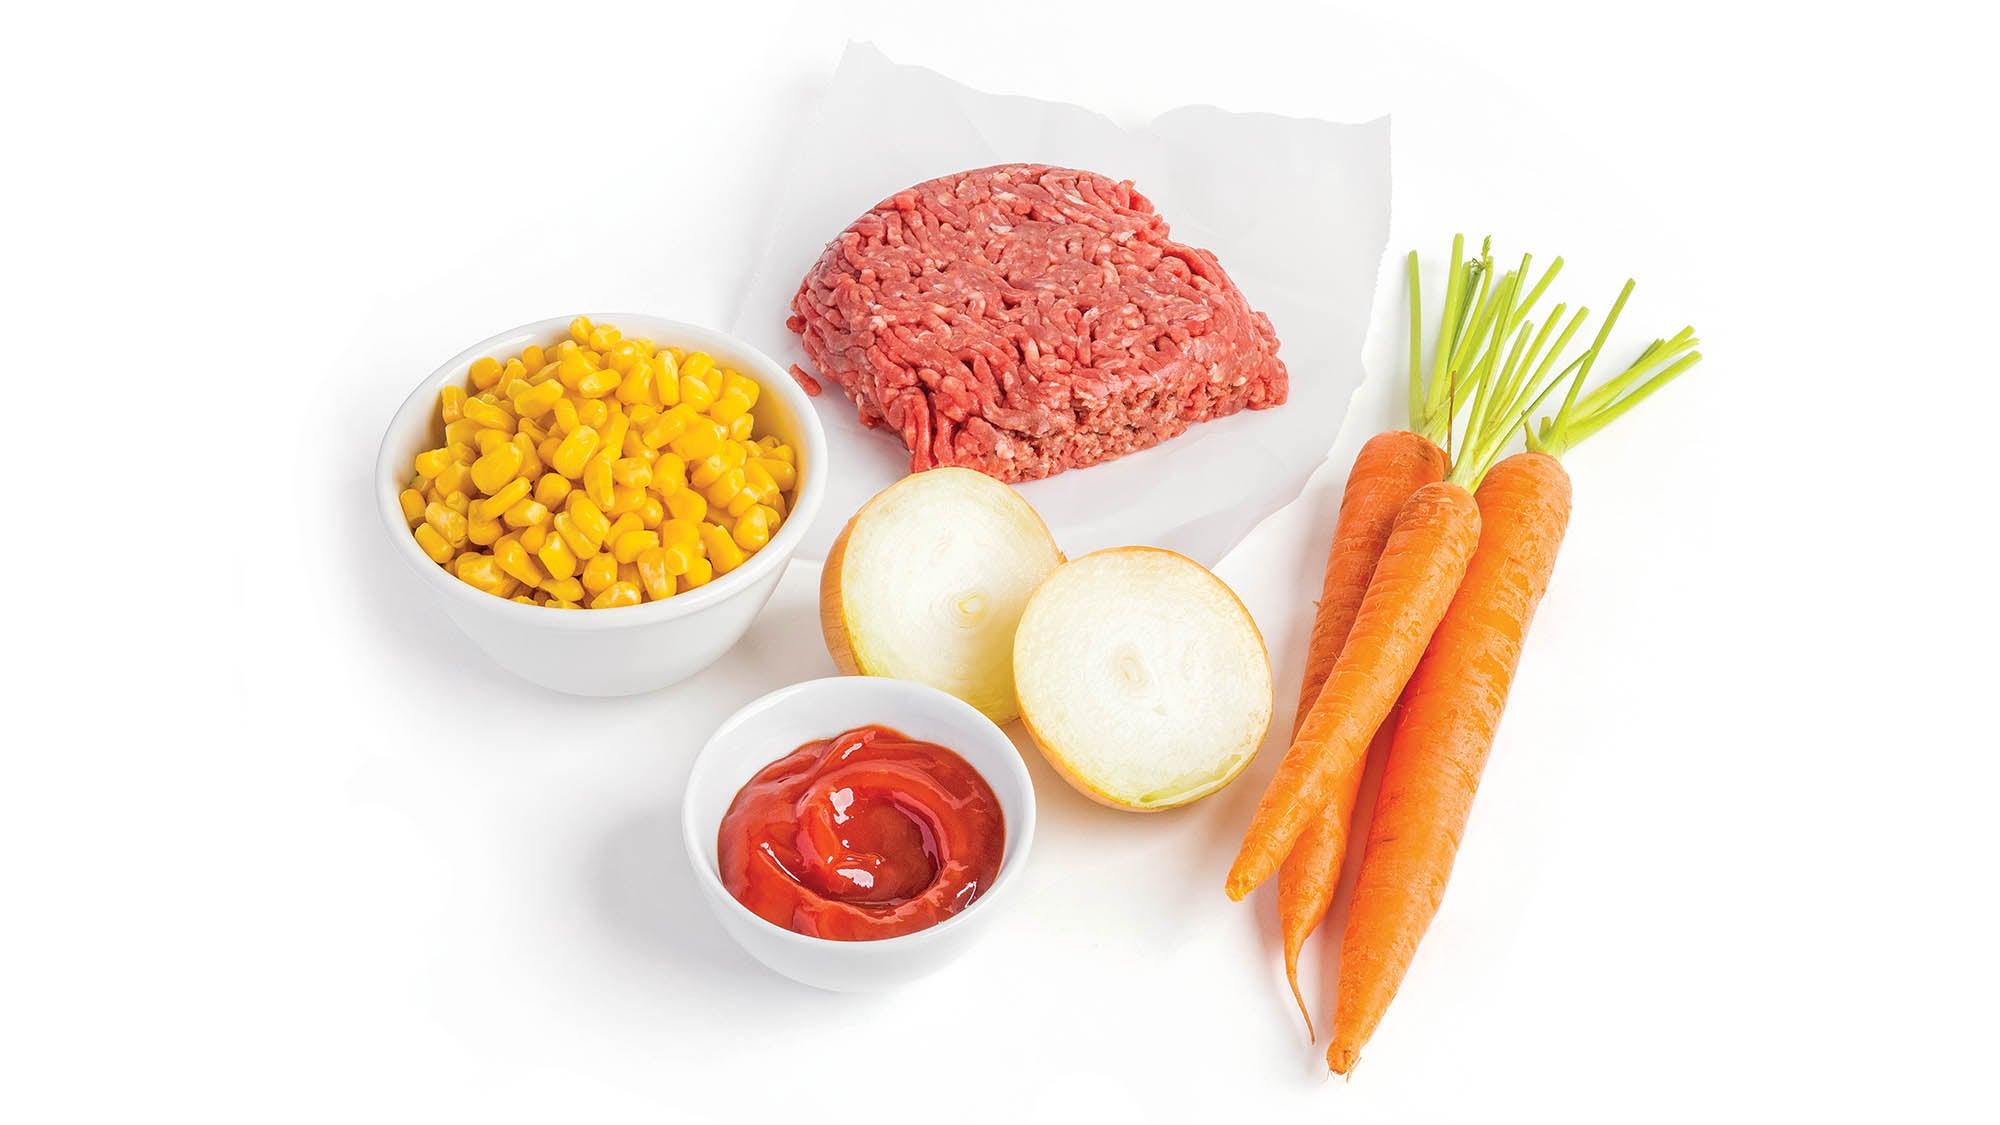 Beef, onion, carrots, corn, tomato paste